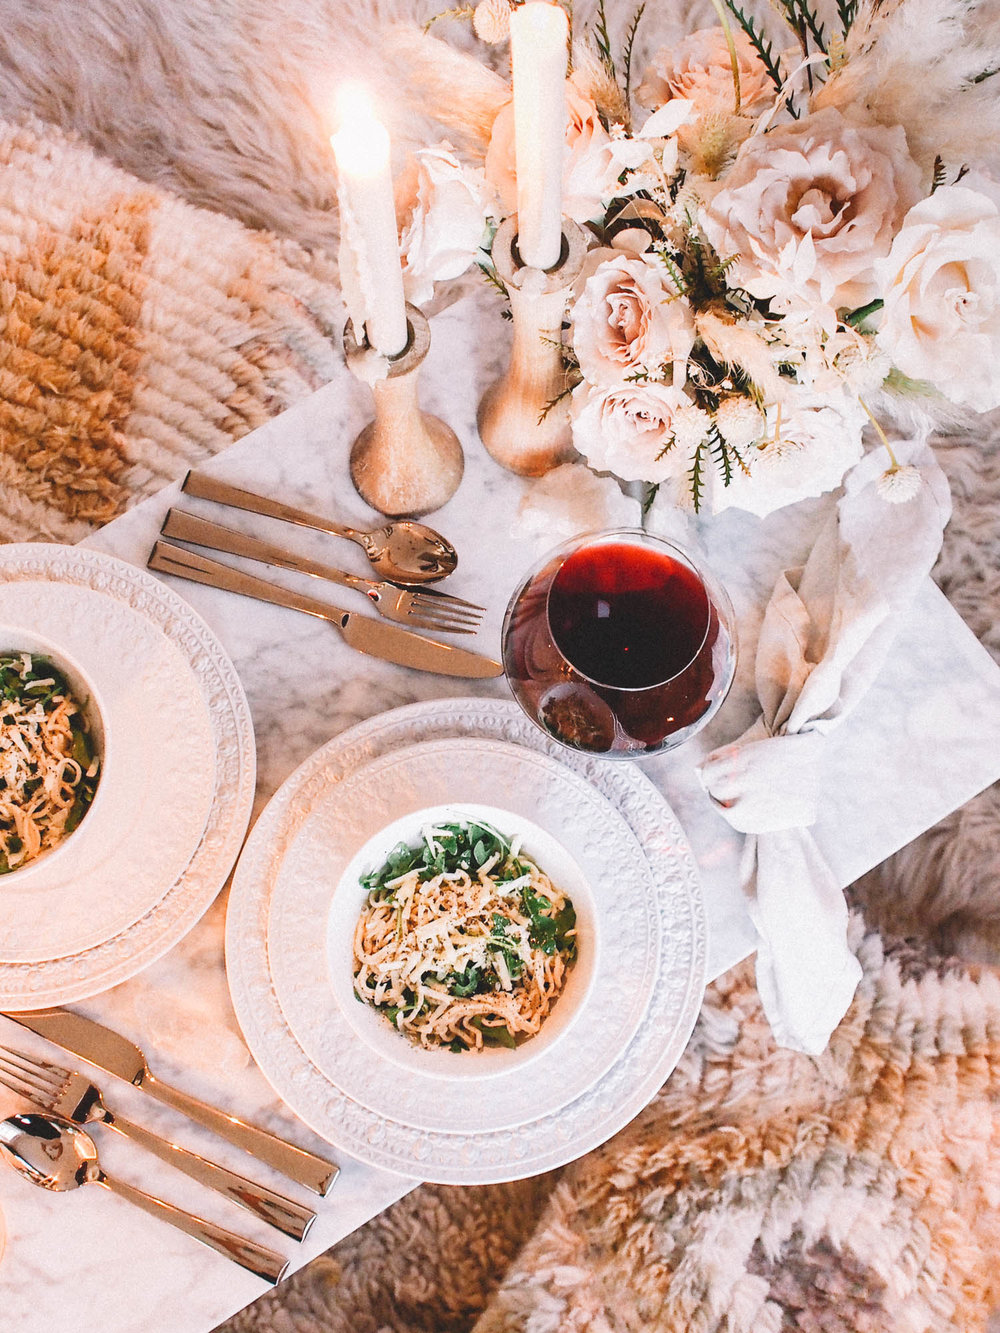 Easy pasta date night recipe | A Fabulous Fete